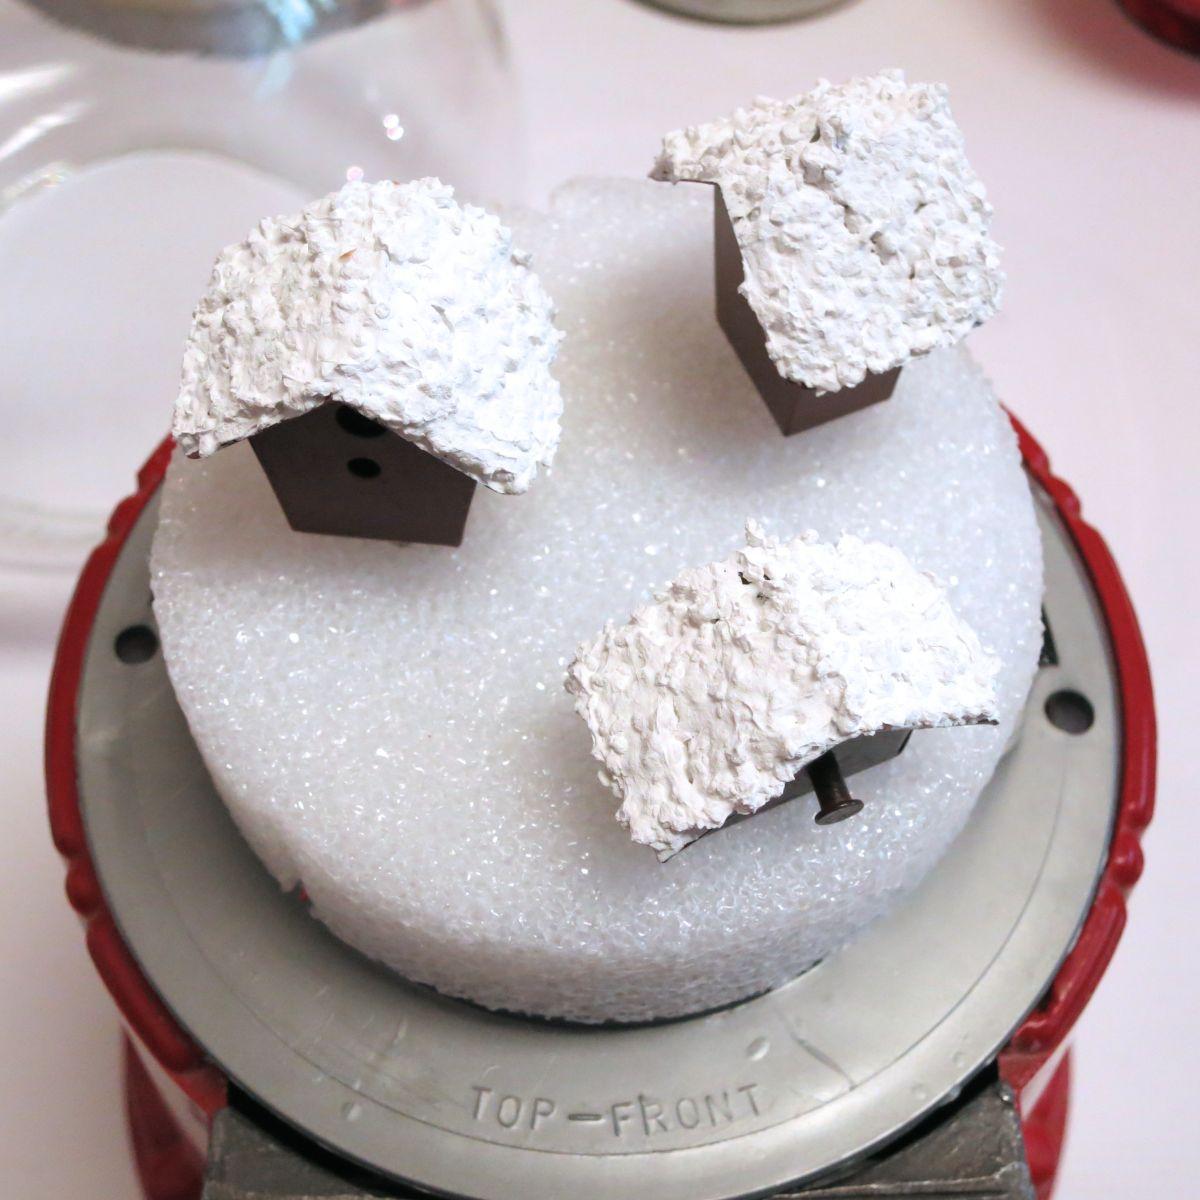 Make Gumball Machine Snow Globe Decor - add the tiny houses